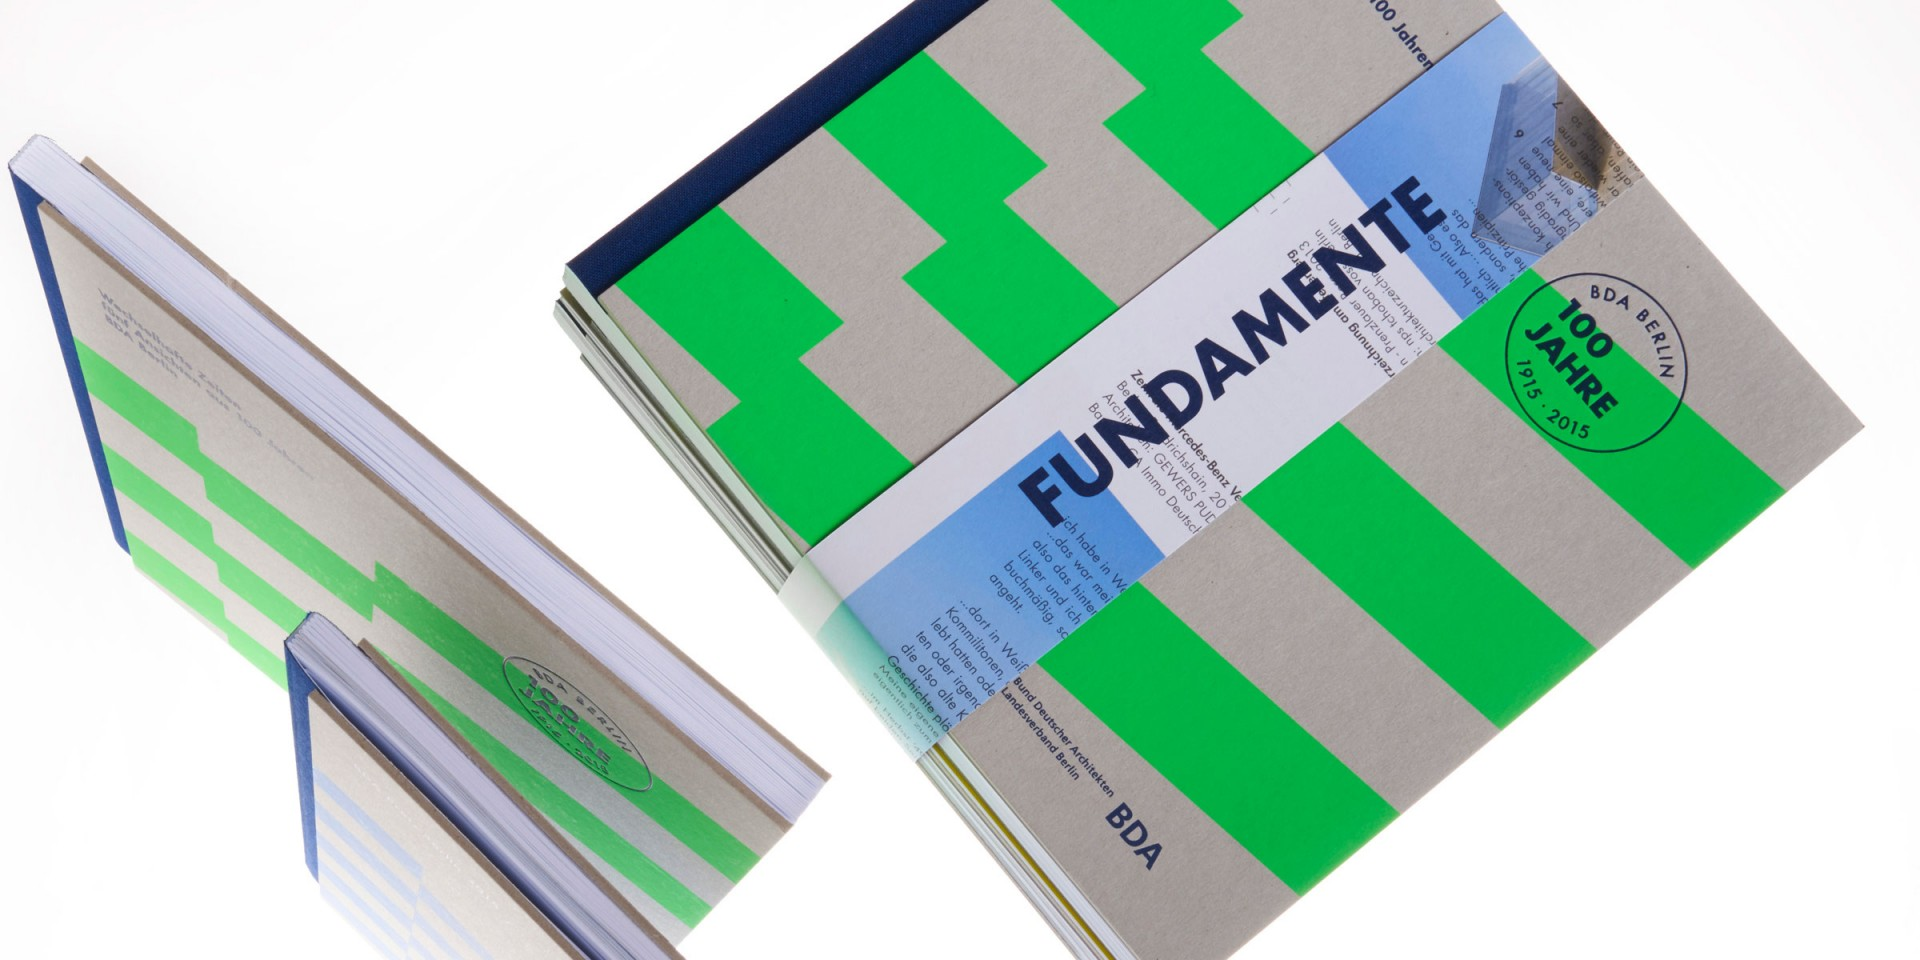 Anke Krey Königsdruck Printmedien GmbH, seit 2015